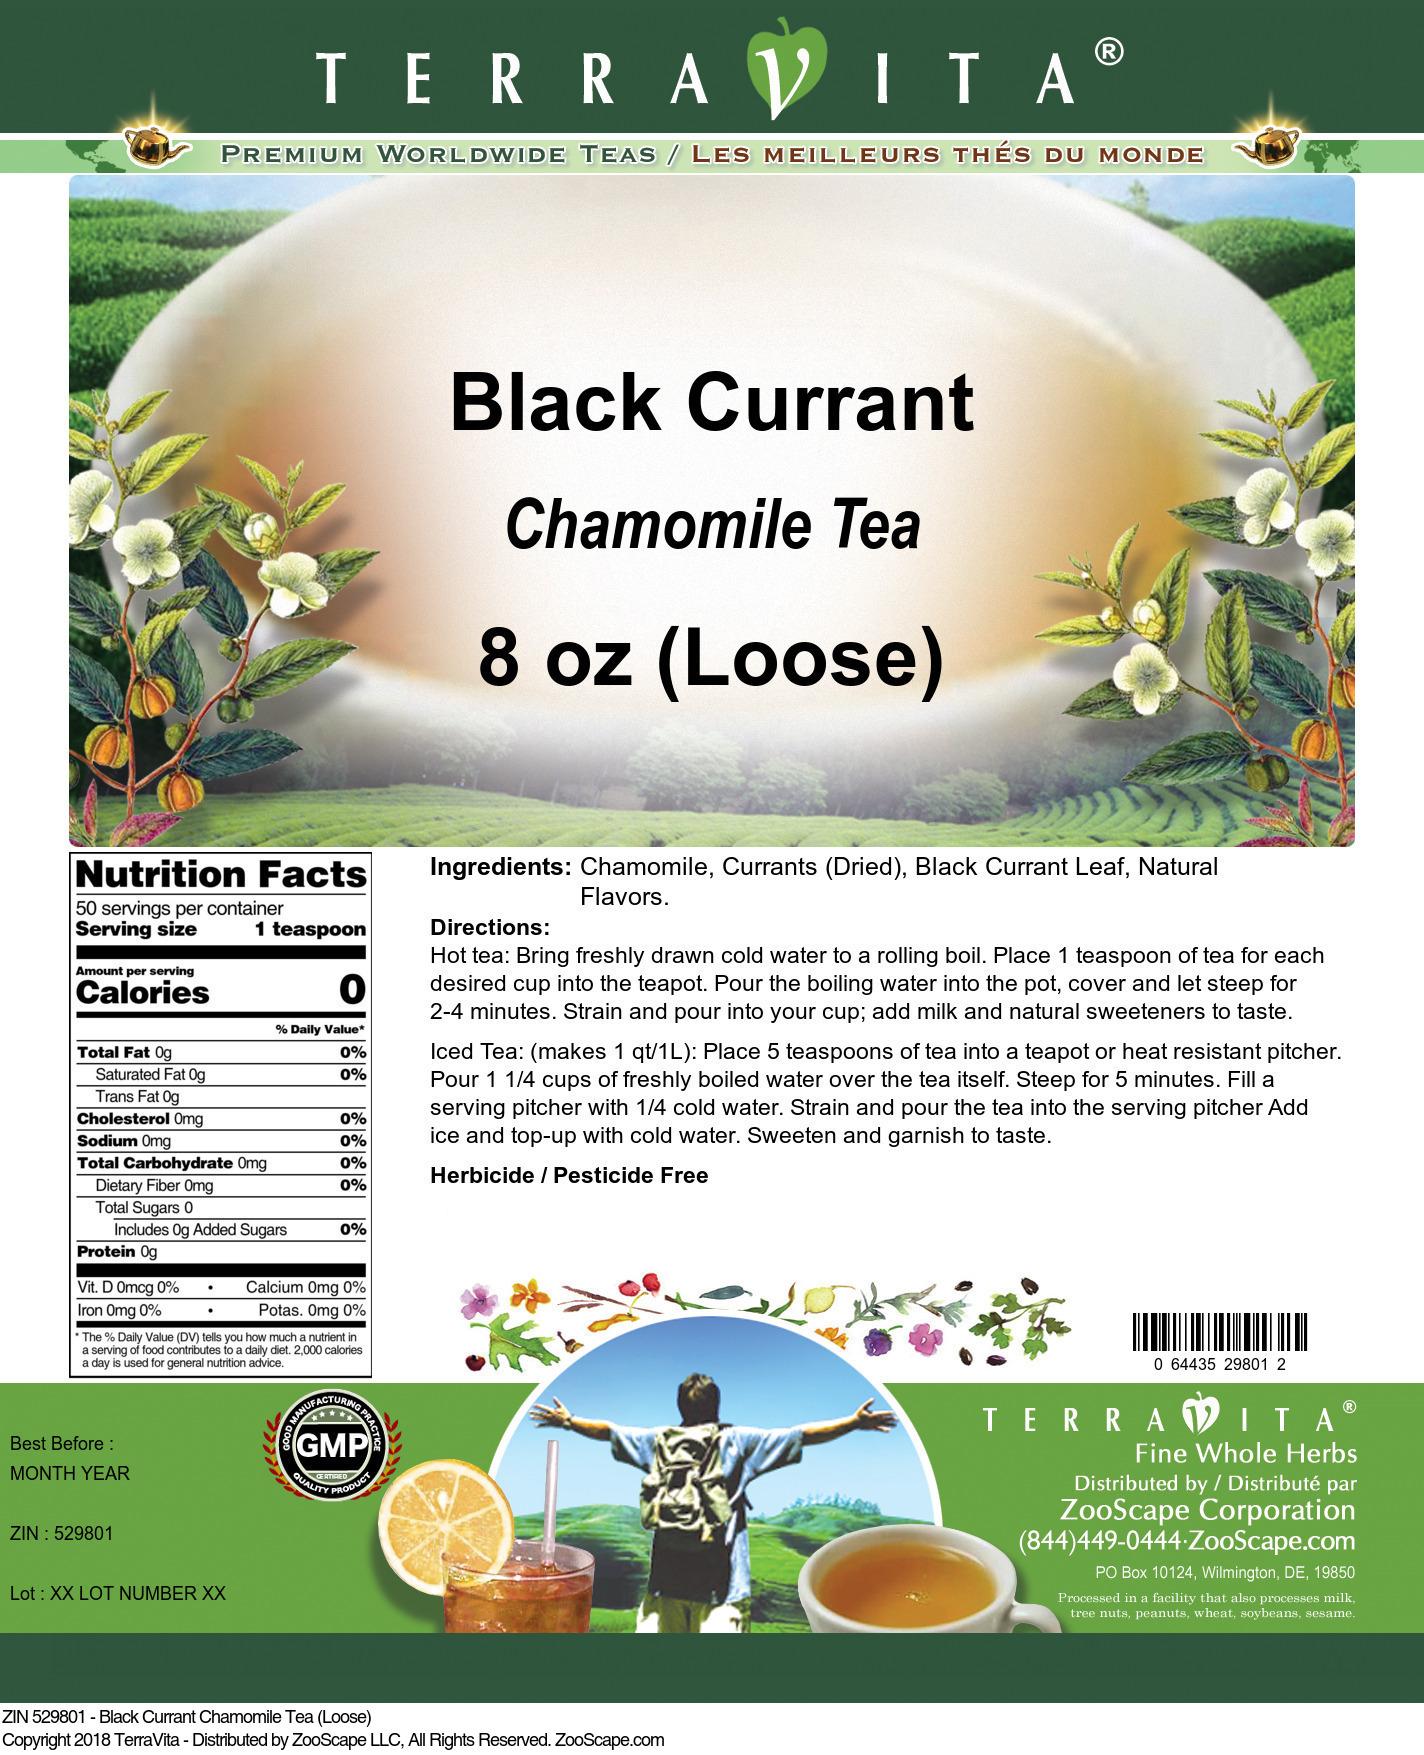 Black Currant Chamomile Tea (Loose)